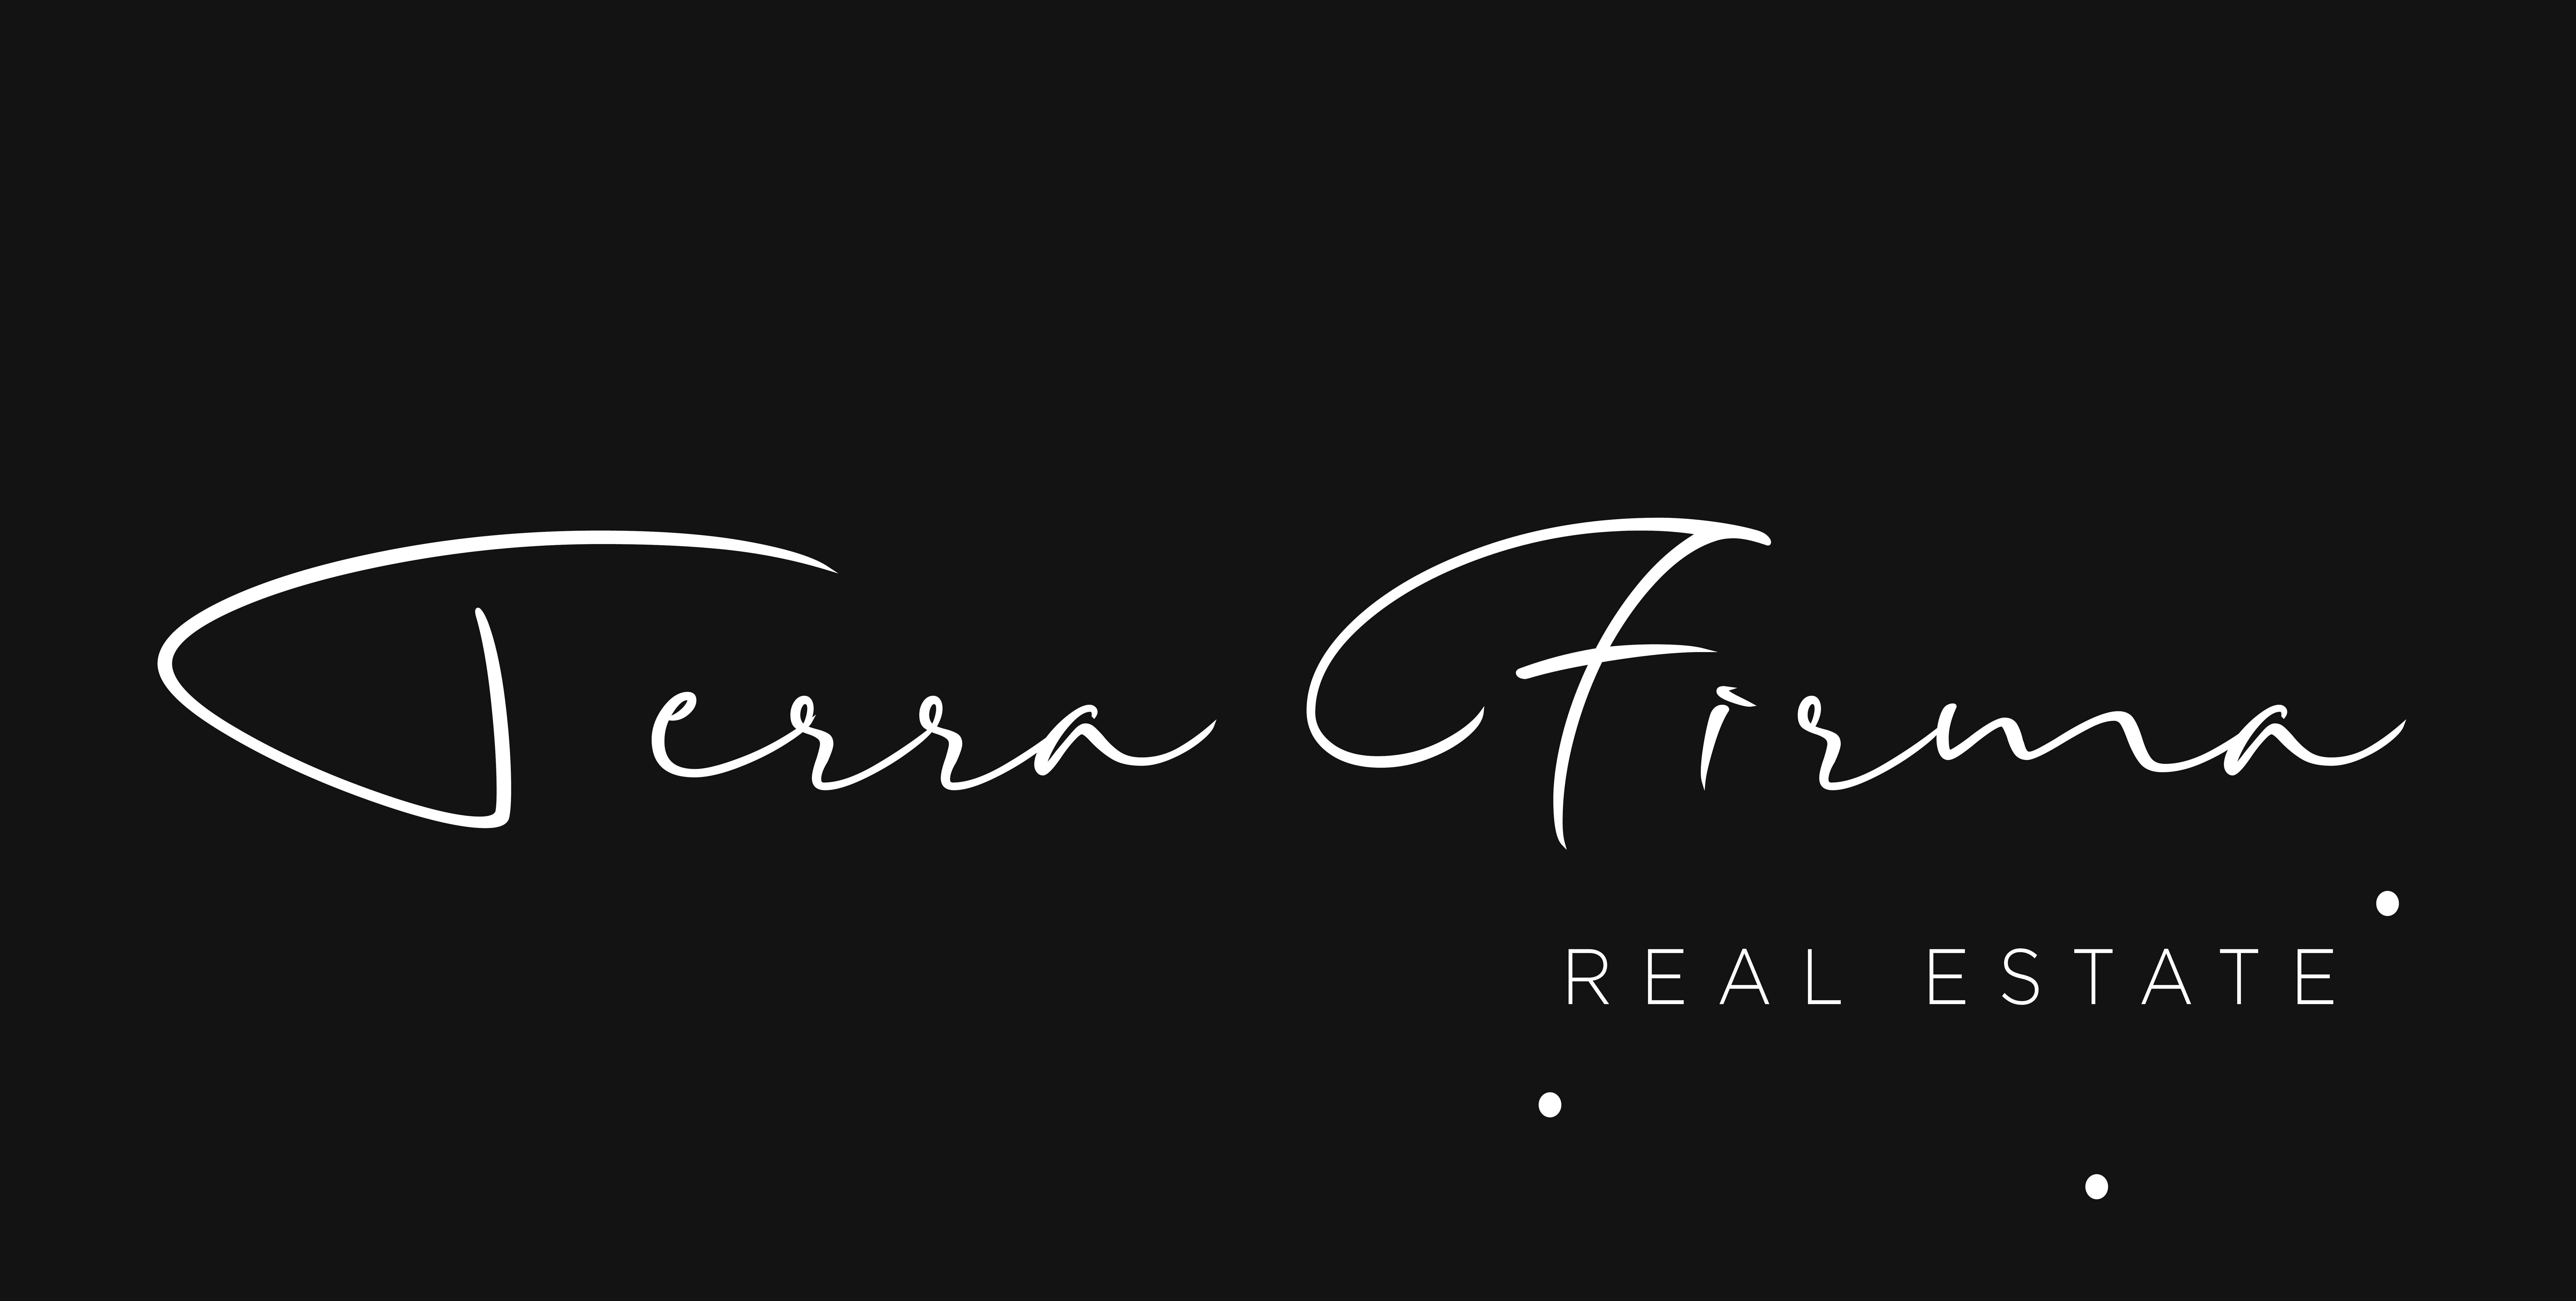 terra-firma_logo_cuadricula-04.jpg